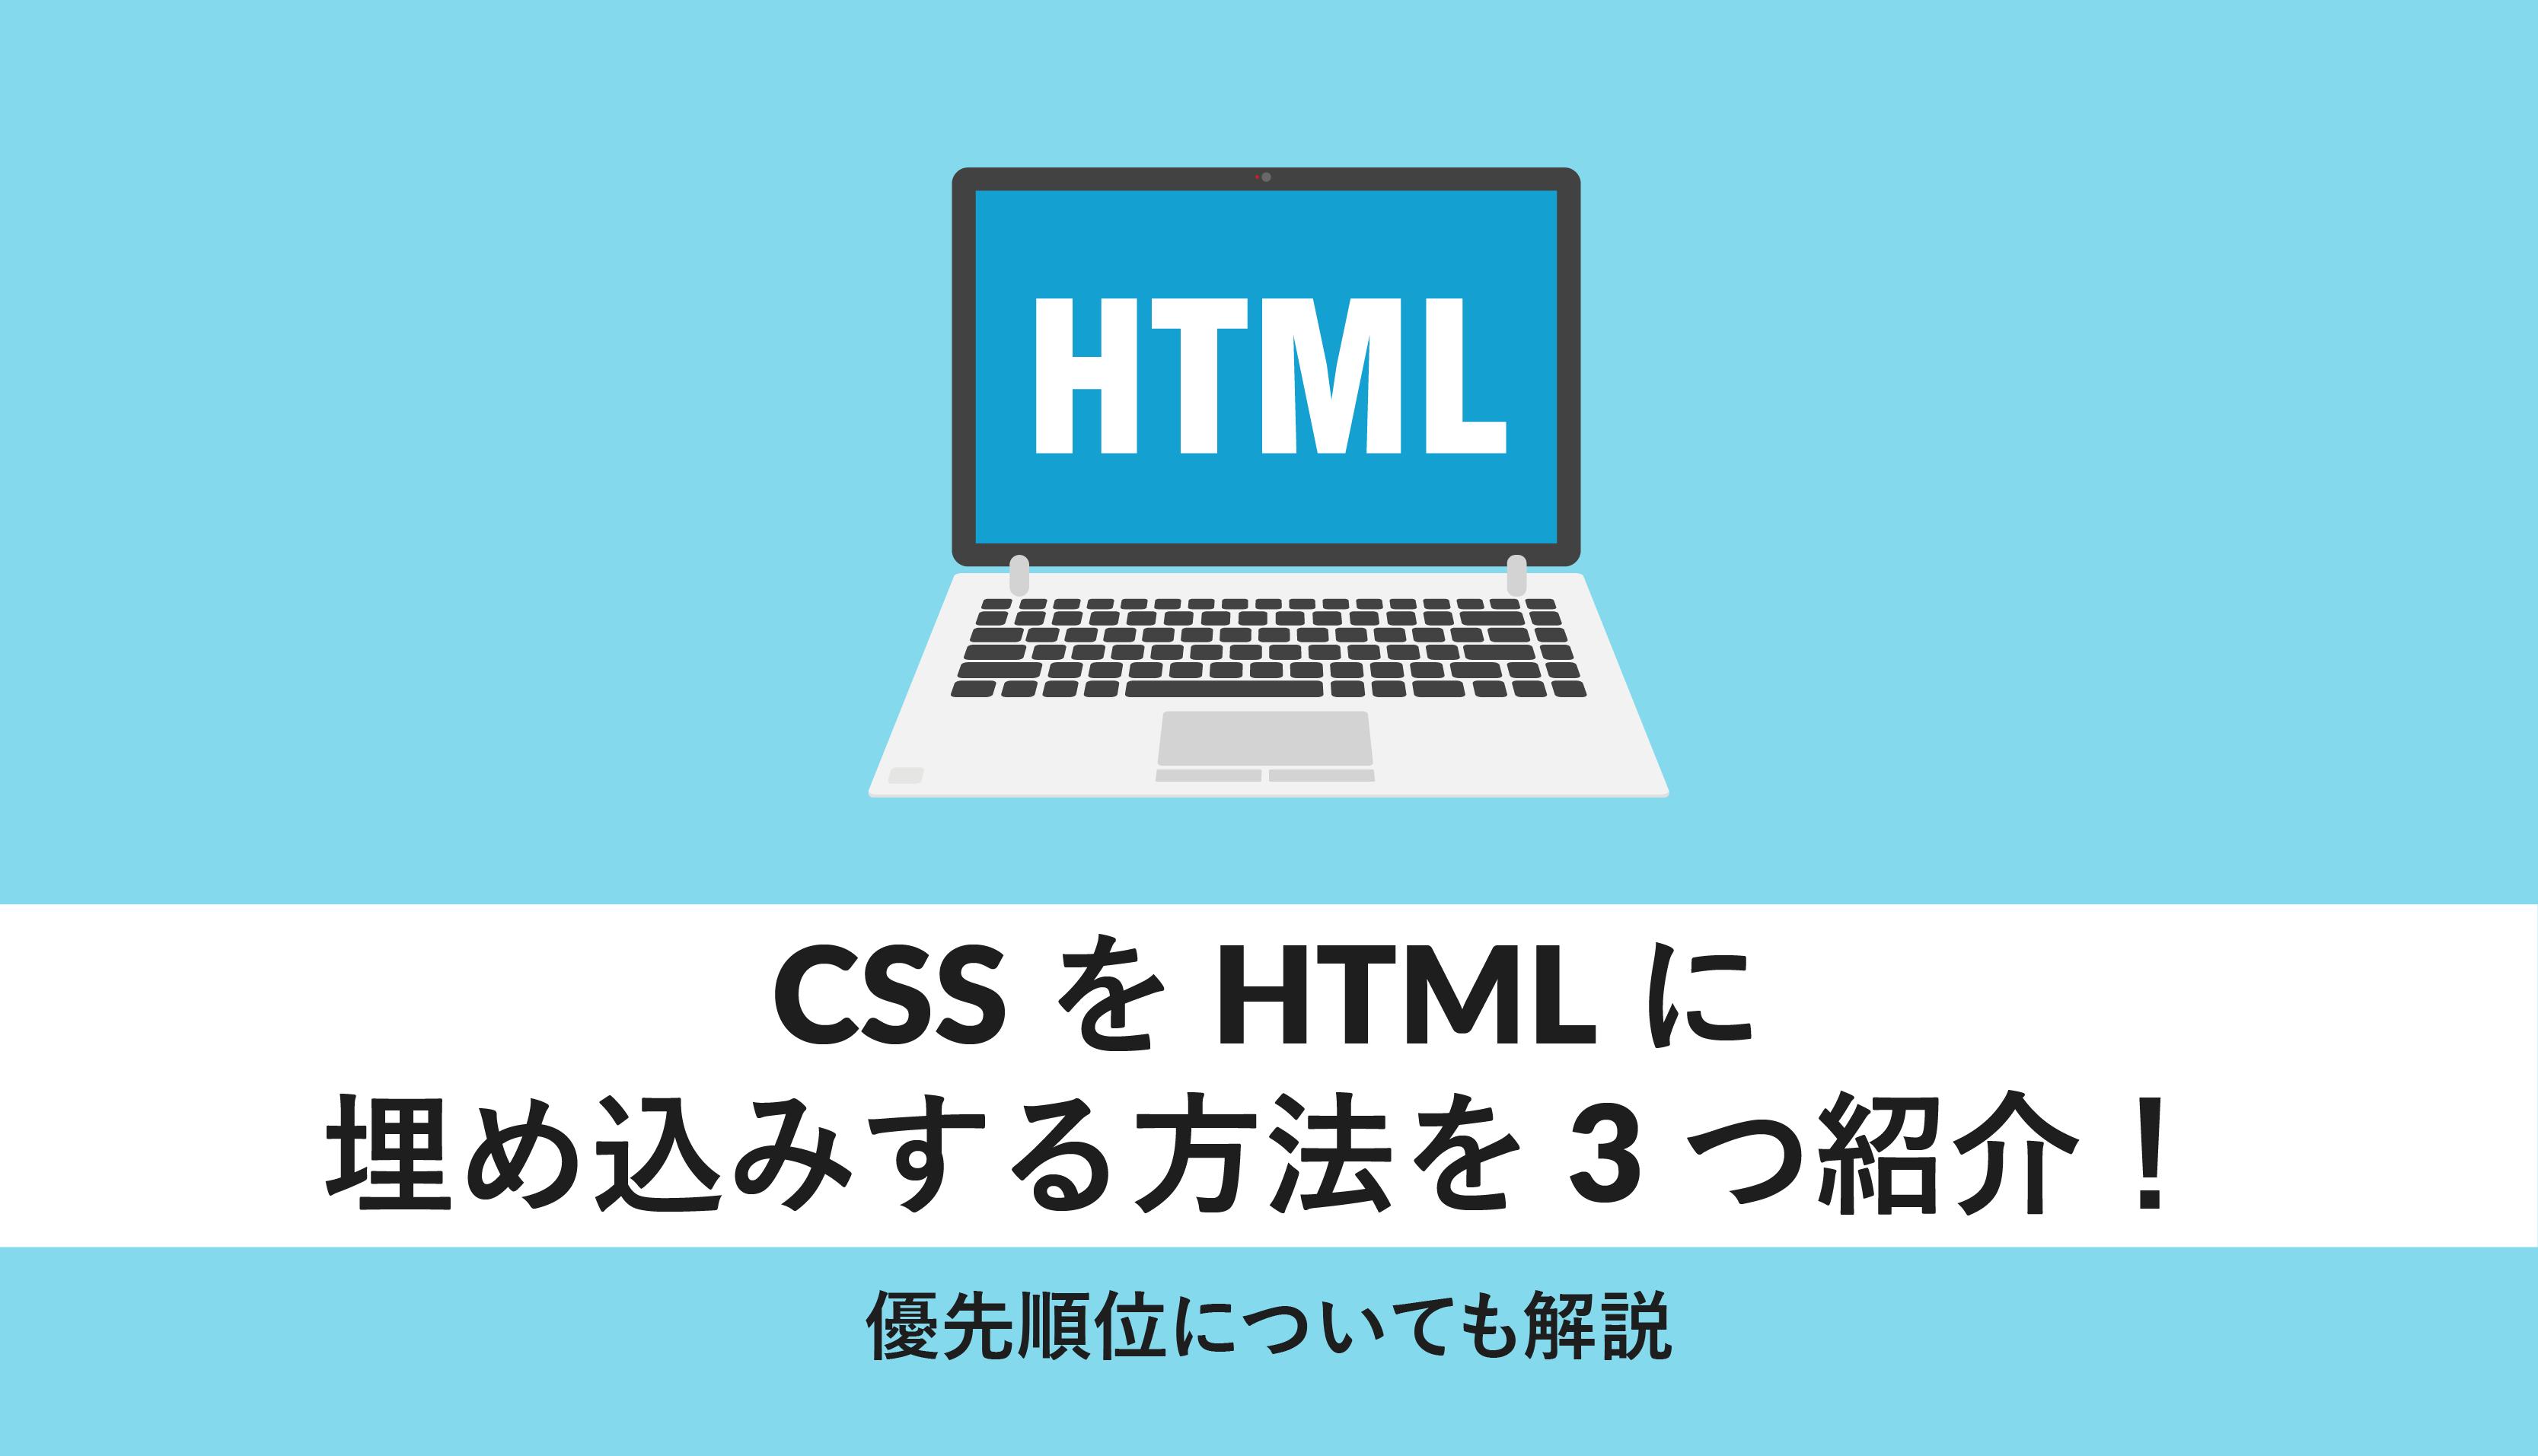 css html 埋め込み